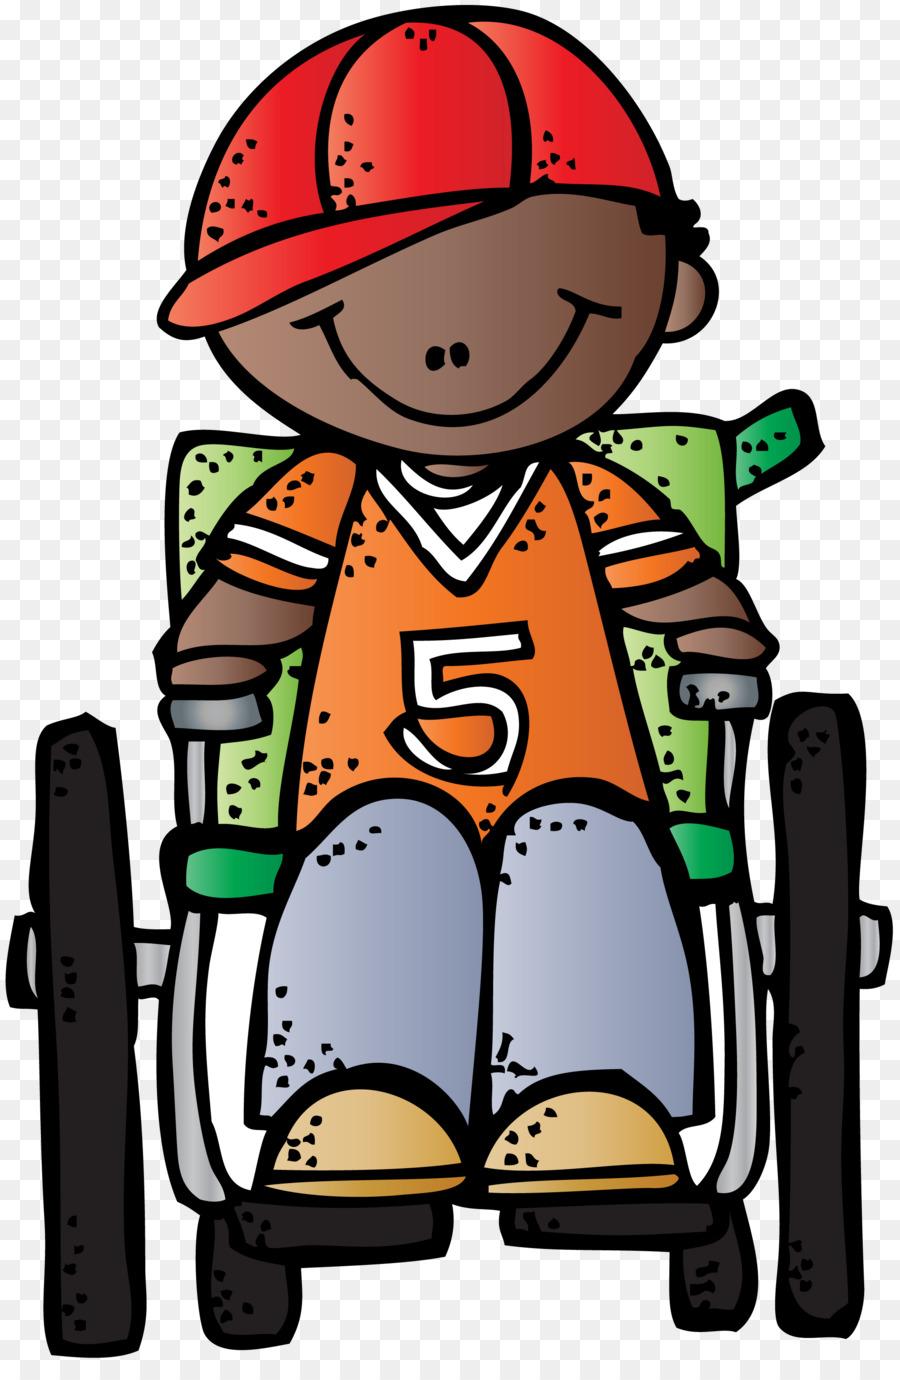 Boy Cartoontransparent png image & clipart free download.